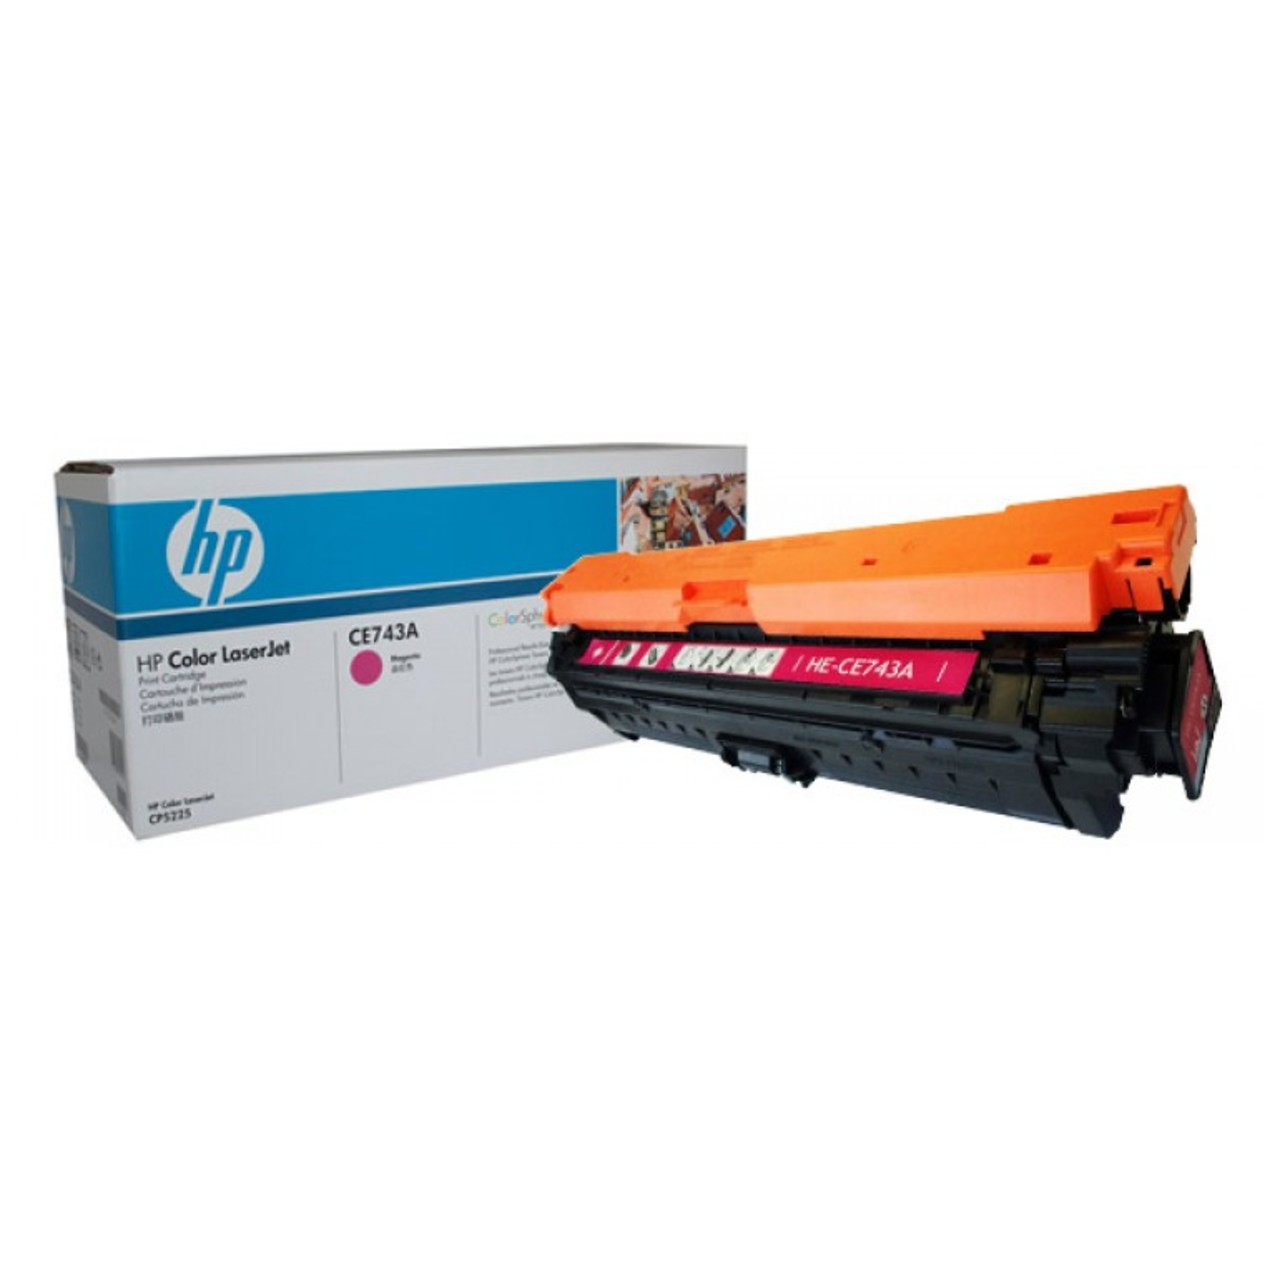 Заправка картриджа CE743A для HP Color LaserJet Professional CP5225